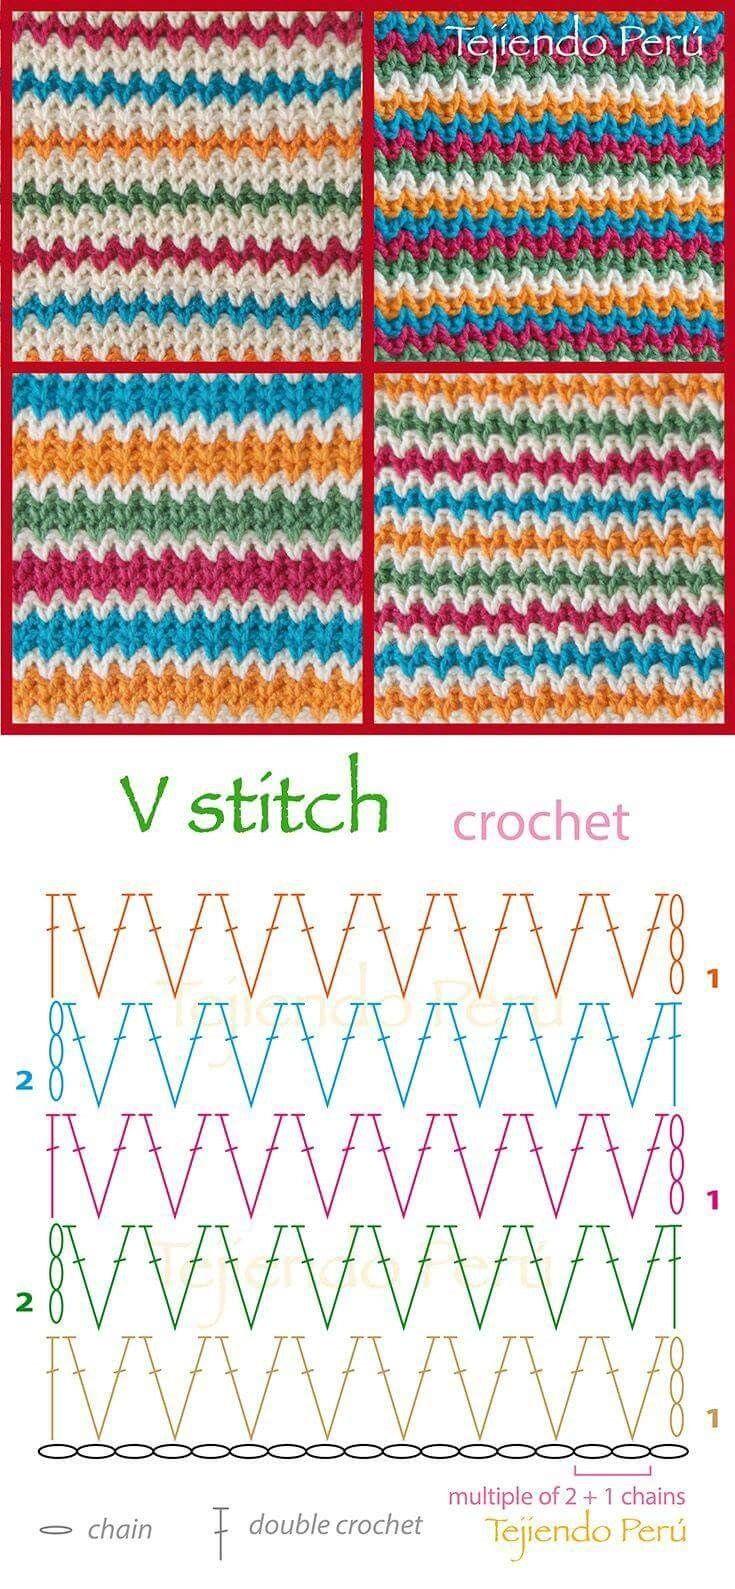 Pin de 유아린 en 코바늘 | Pinterest | Croché, Ganchillo y Ganchillo ...